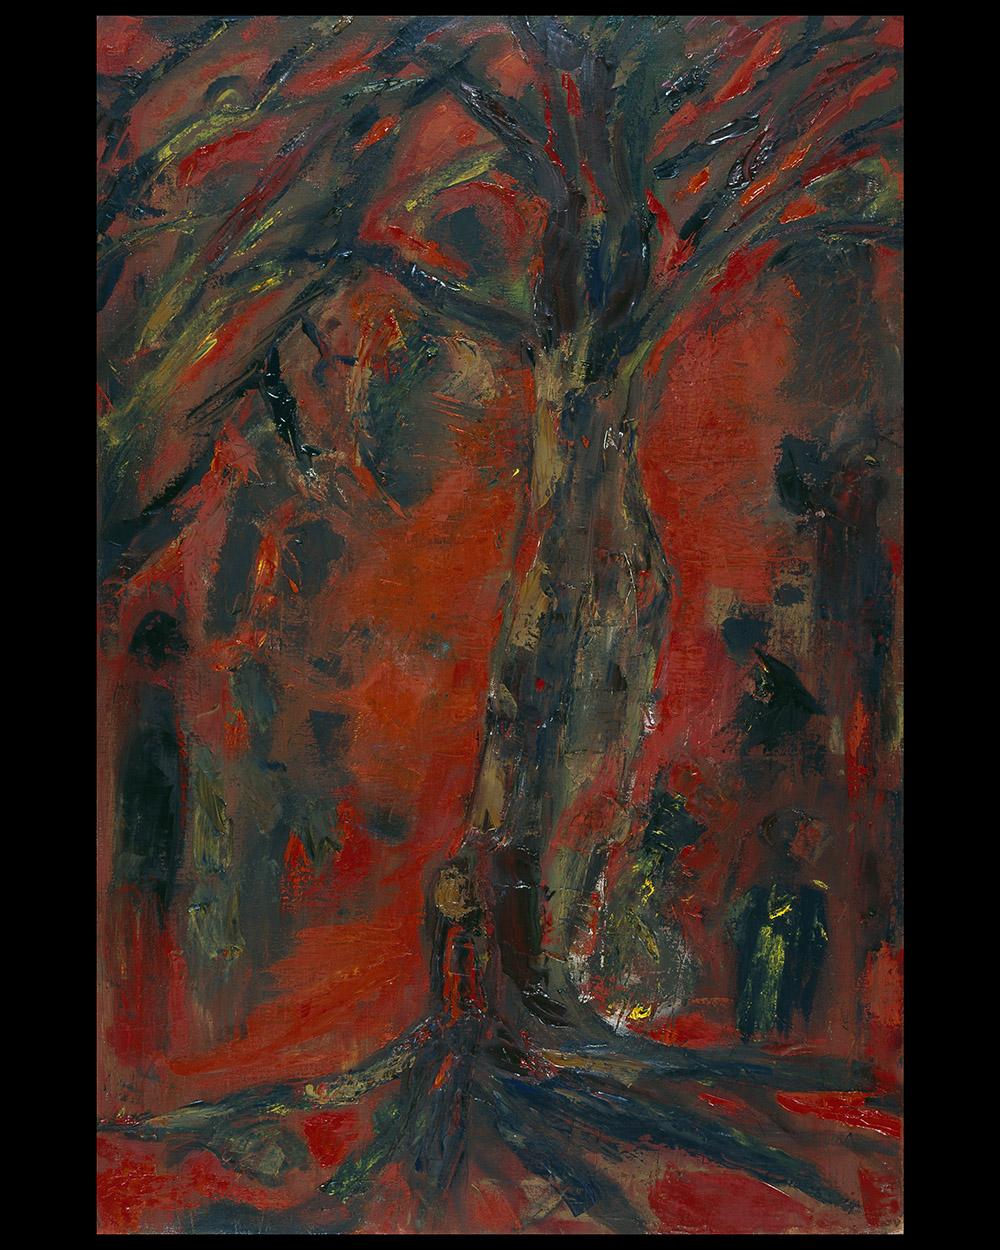 8.-Ono-The-Woods-2006.-Oil-on-canvas-94-x-61-cm-x.jpg